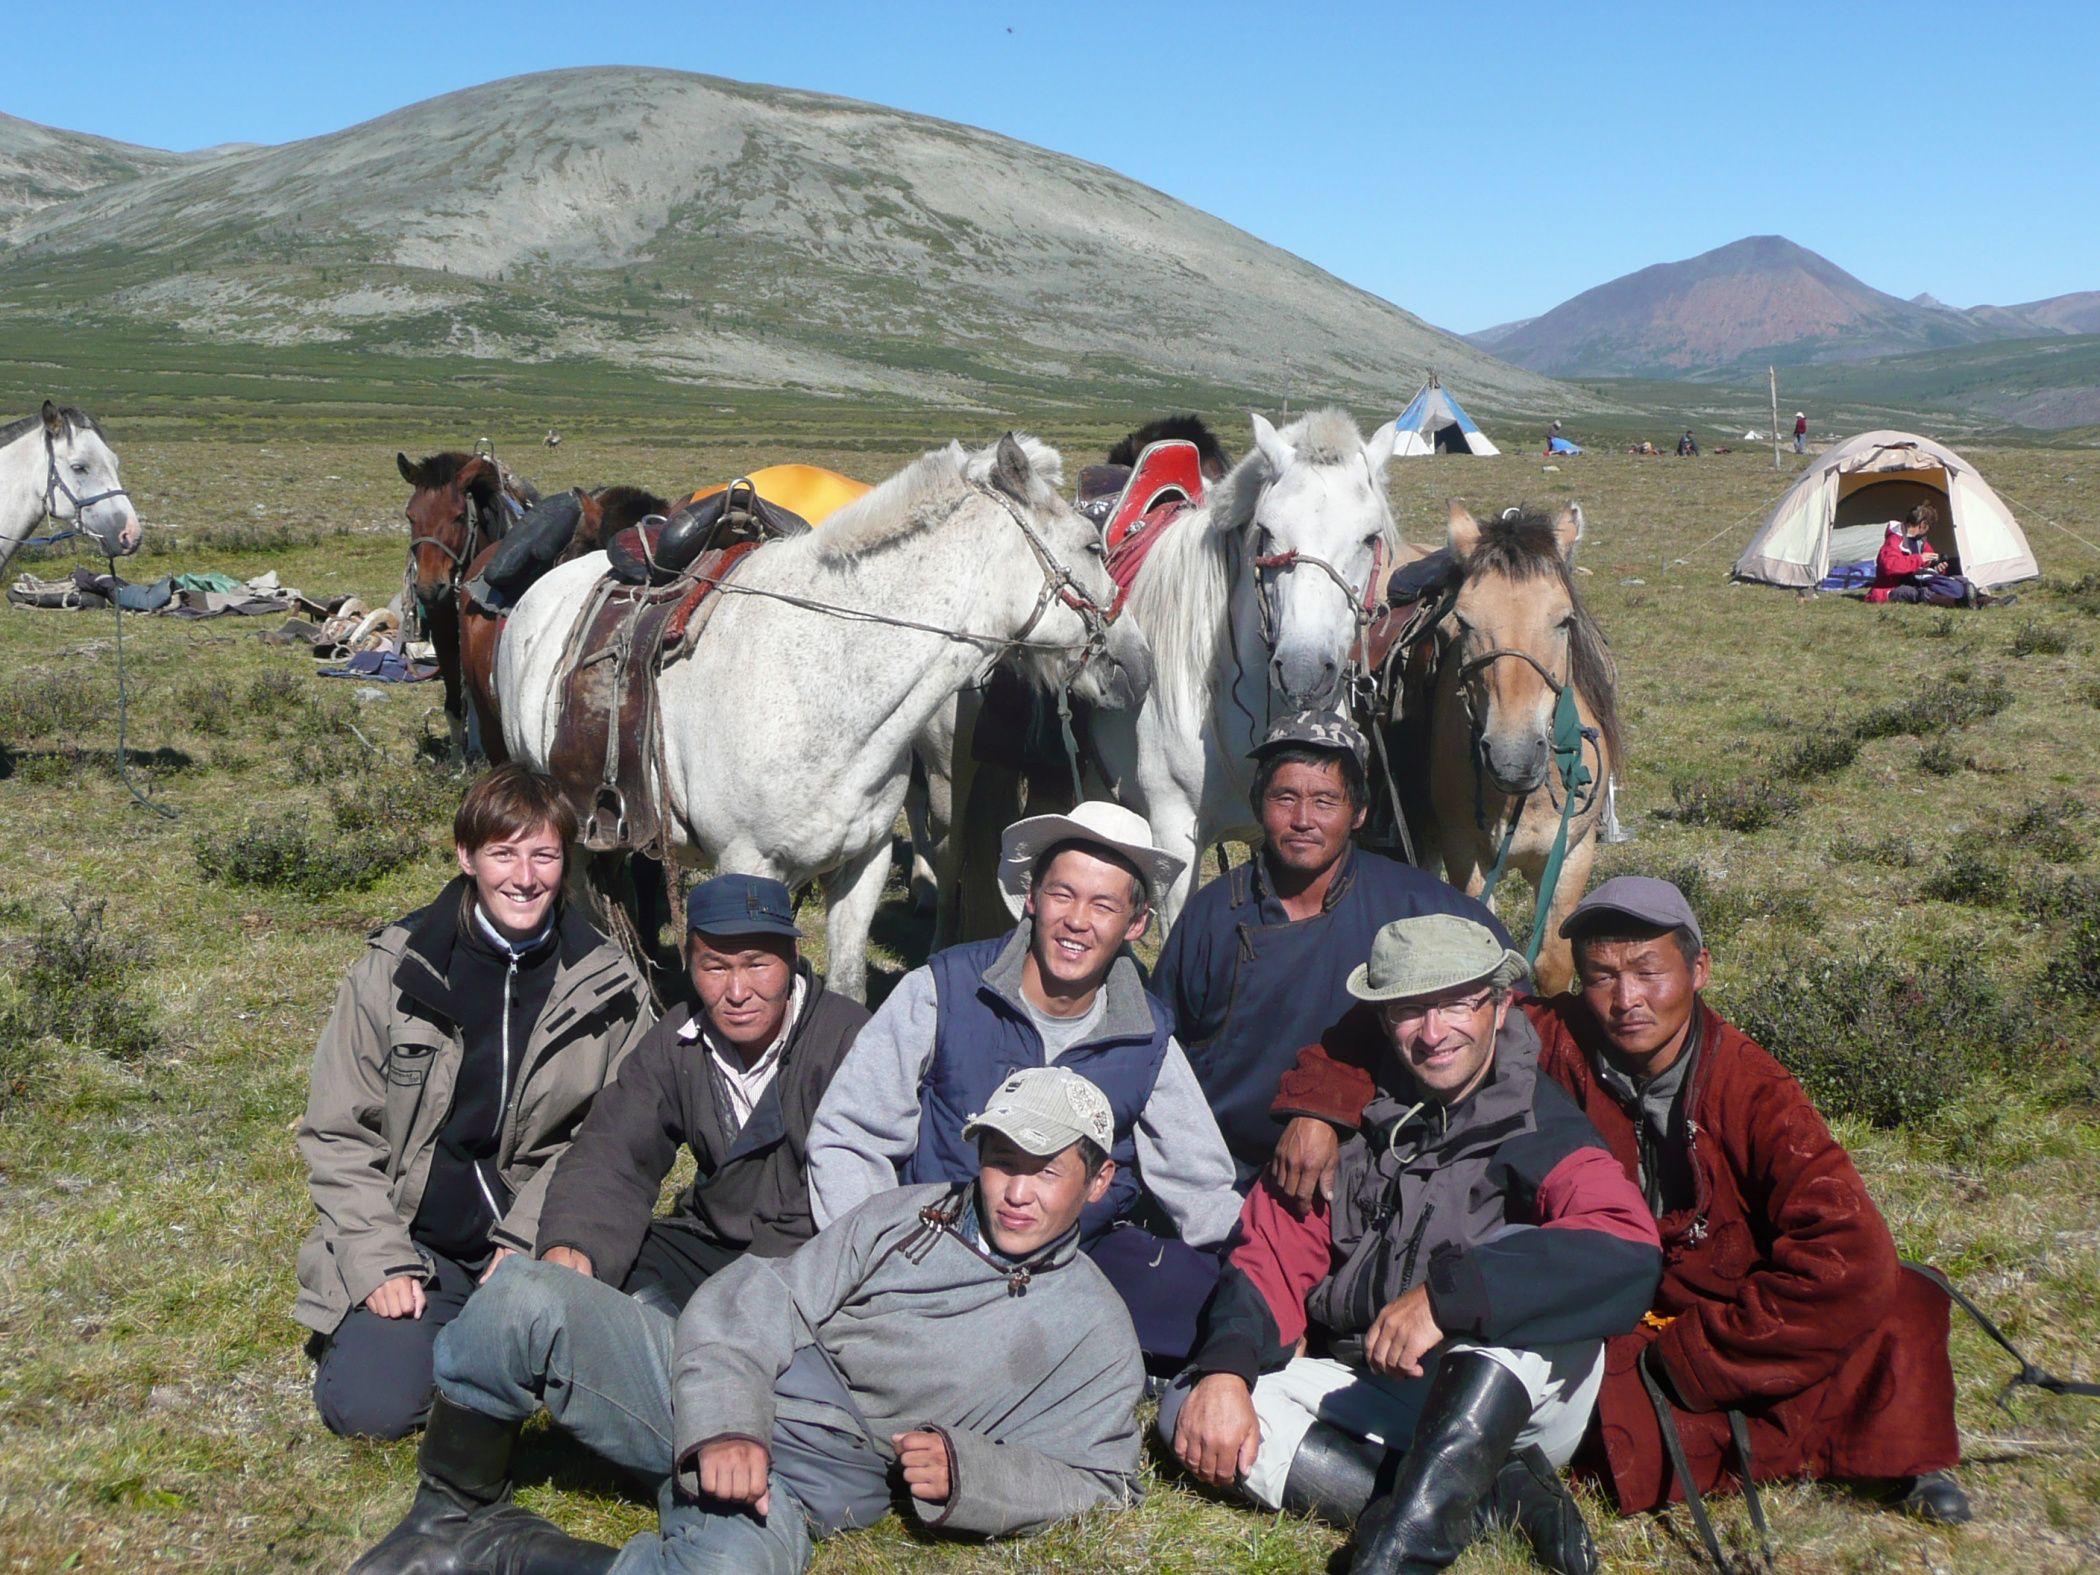 Les gitans de la Taïga C'est en partie à cheval, en plein coeur de la Taïga…